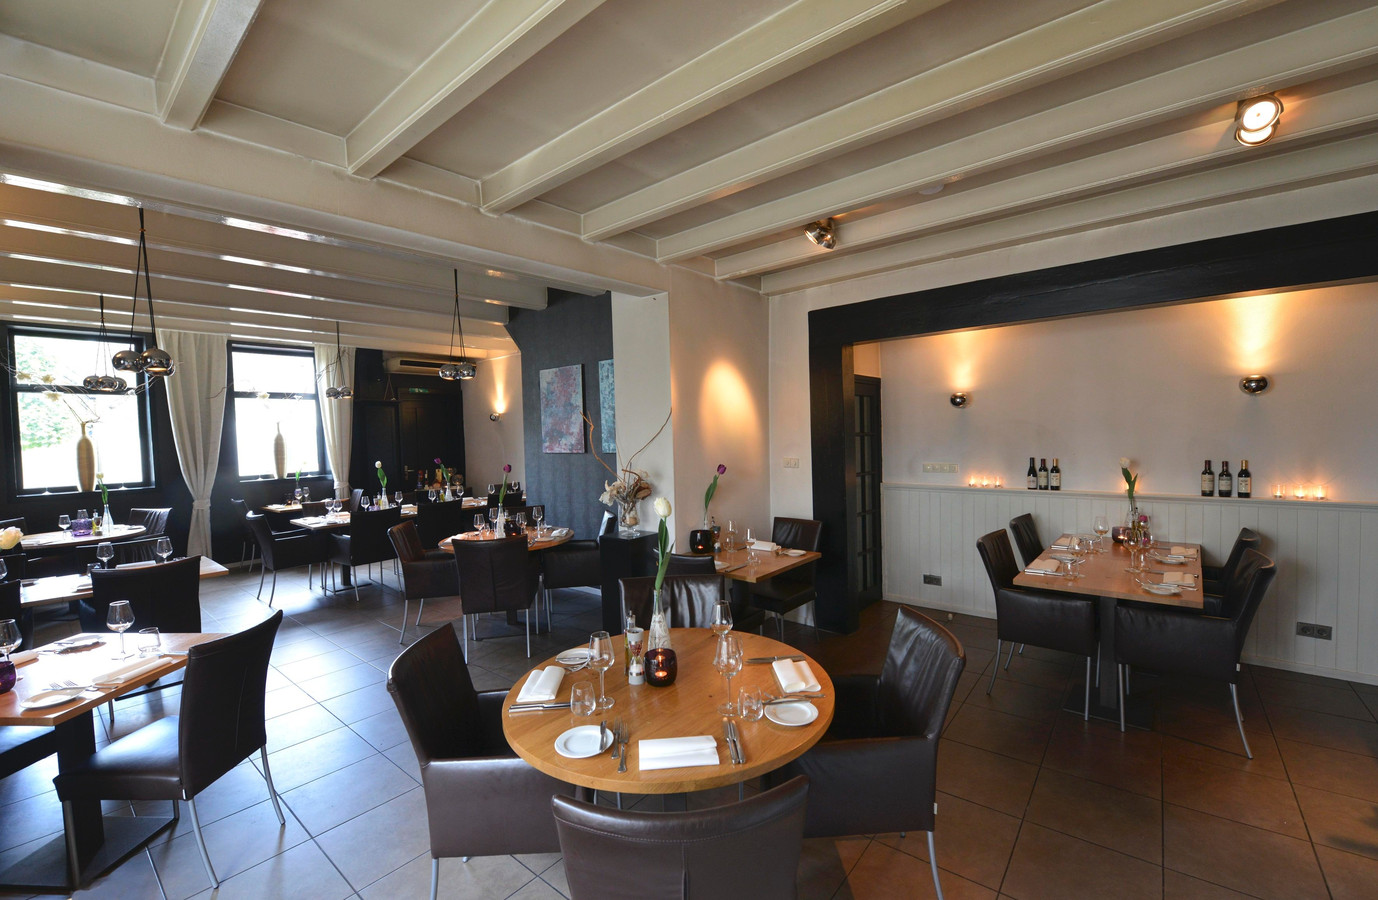 De Oude Betuwe: Piepjonge kookkunst in het oude Tricht | Foto ...